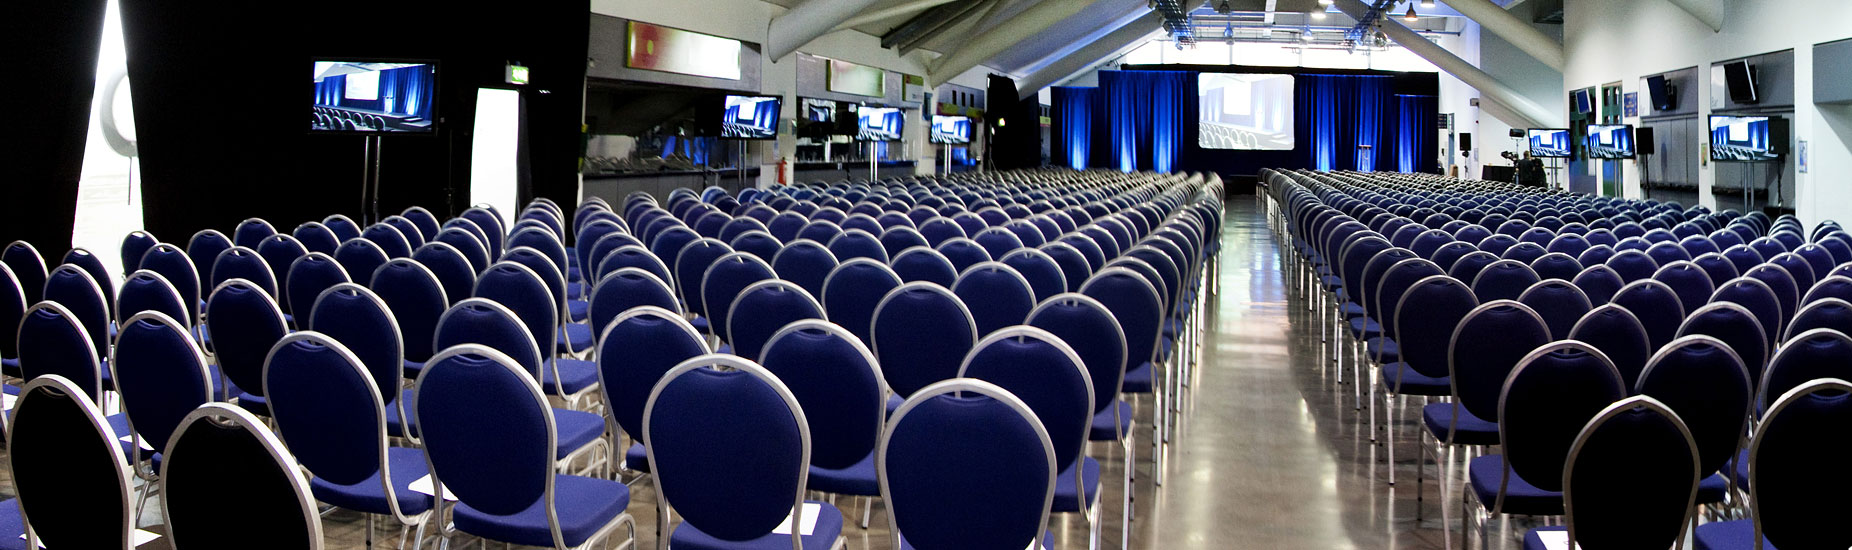 Newbury Banner Conferences Exhibitions